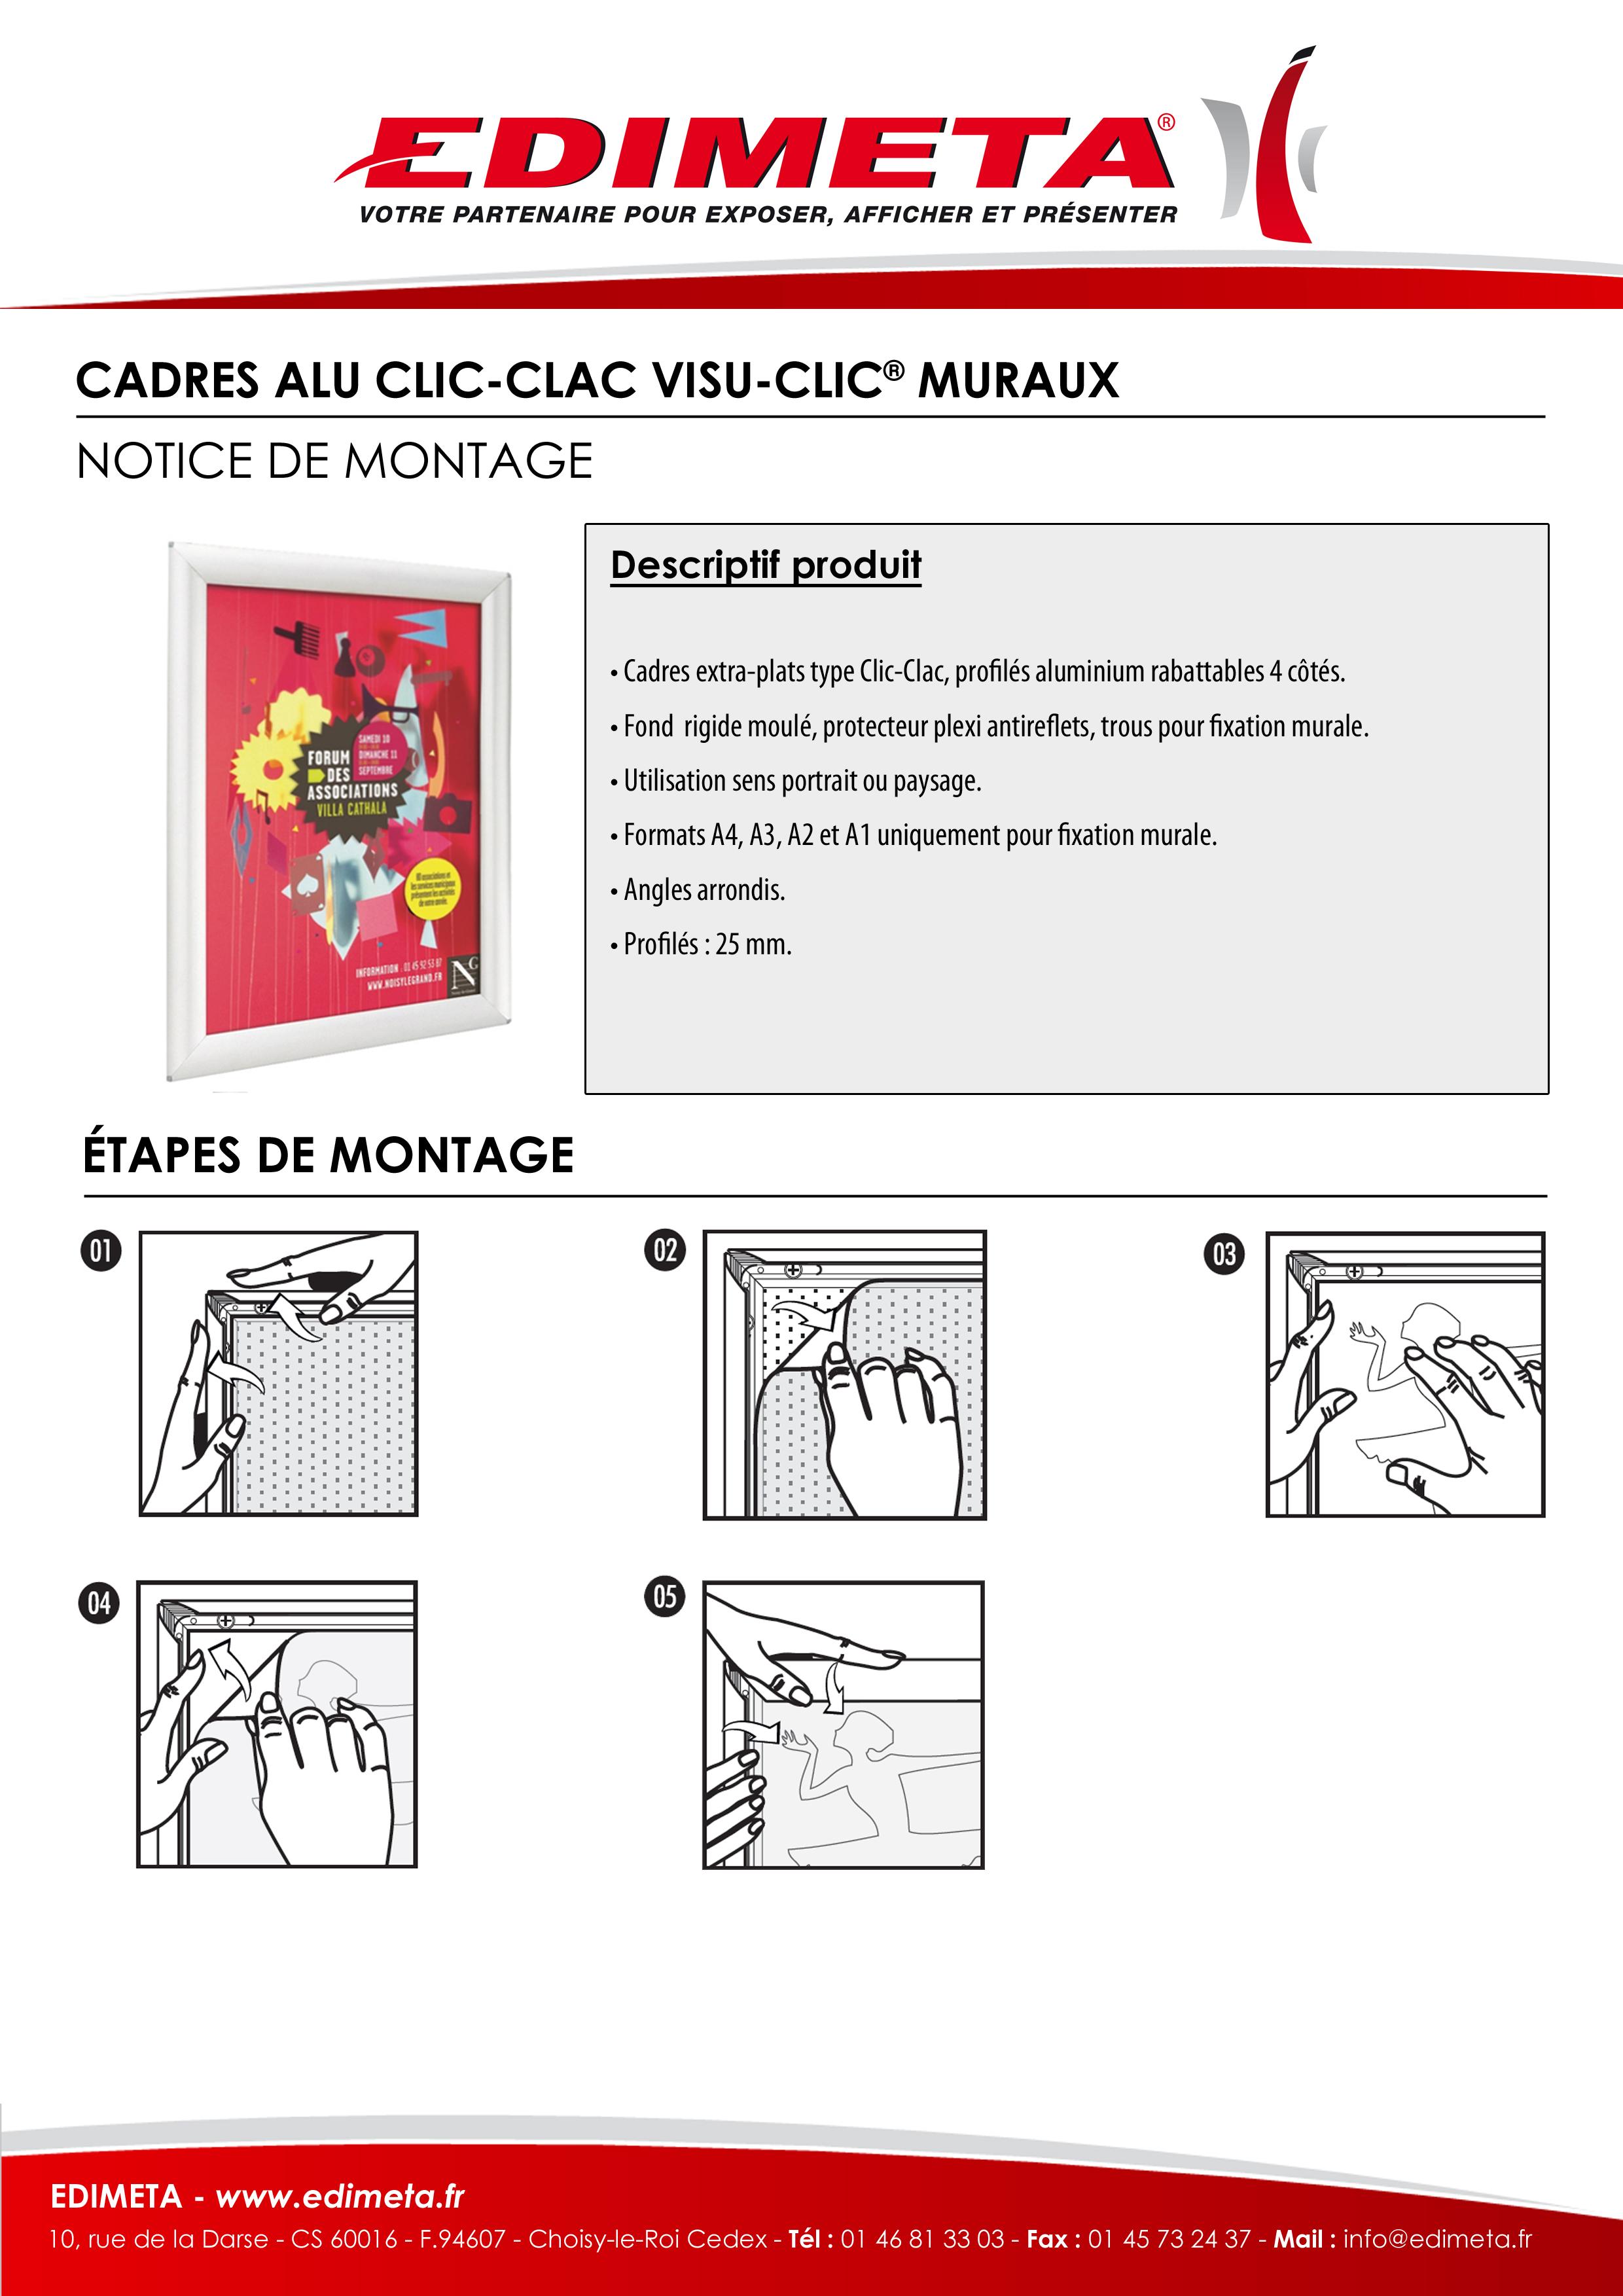 NOTICE DE MONTAGE : CADRE ALU CLIC CLAC VISU-CLIC® MURAUX